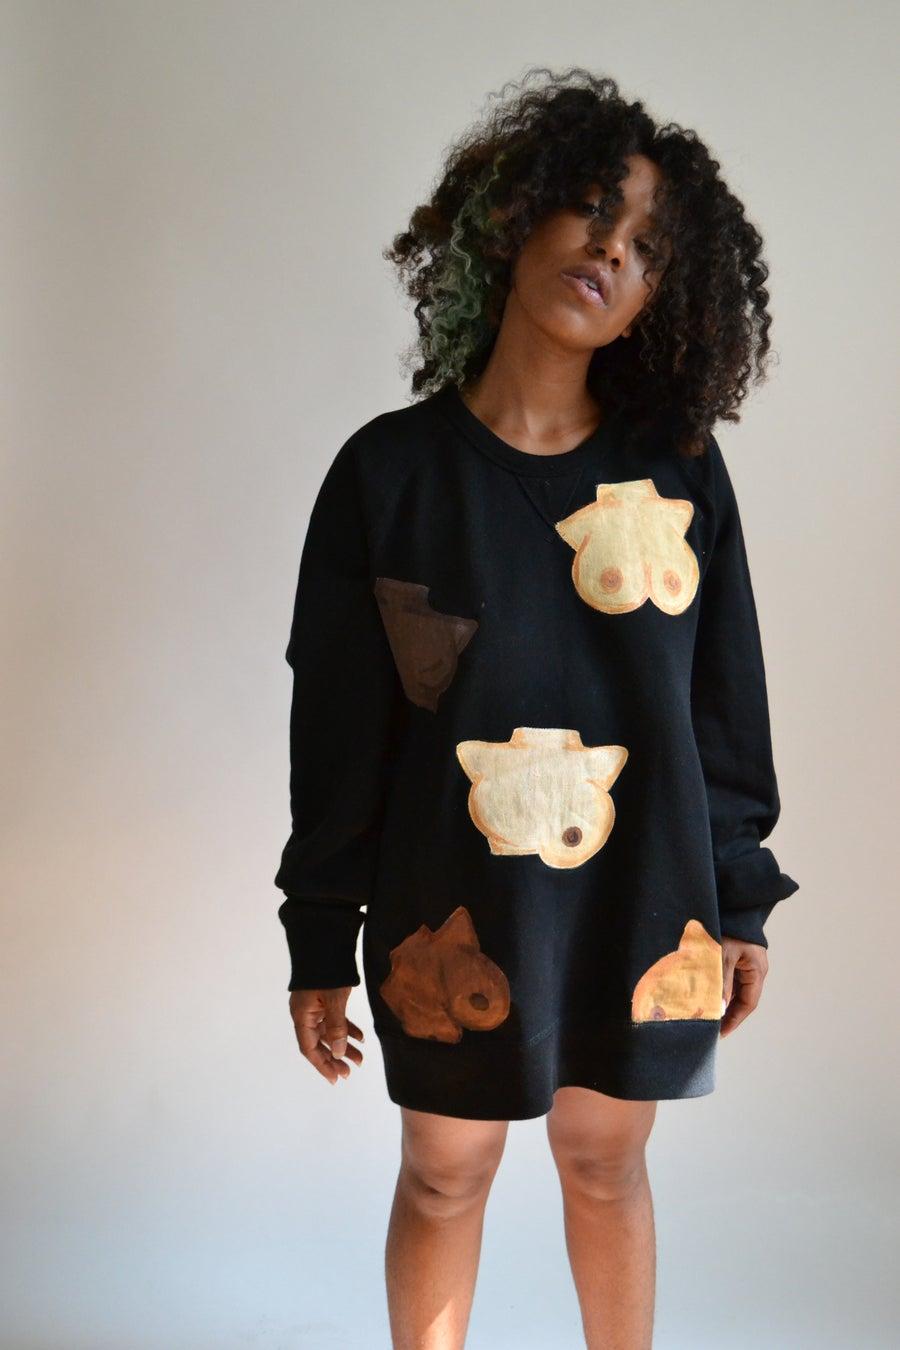 Image of Boobies Gang Crewneck Sweater (unisex)